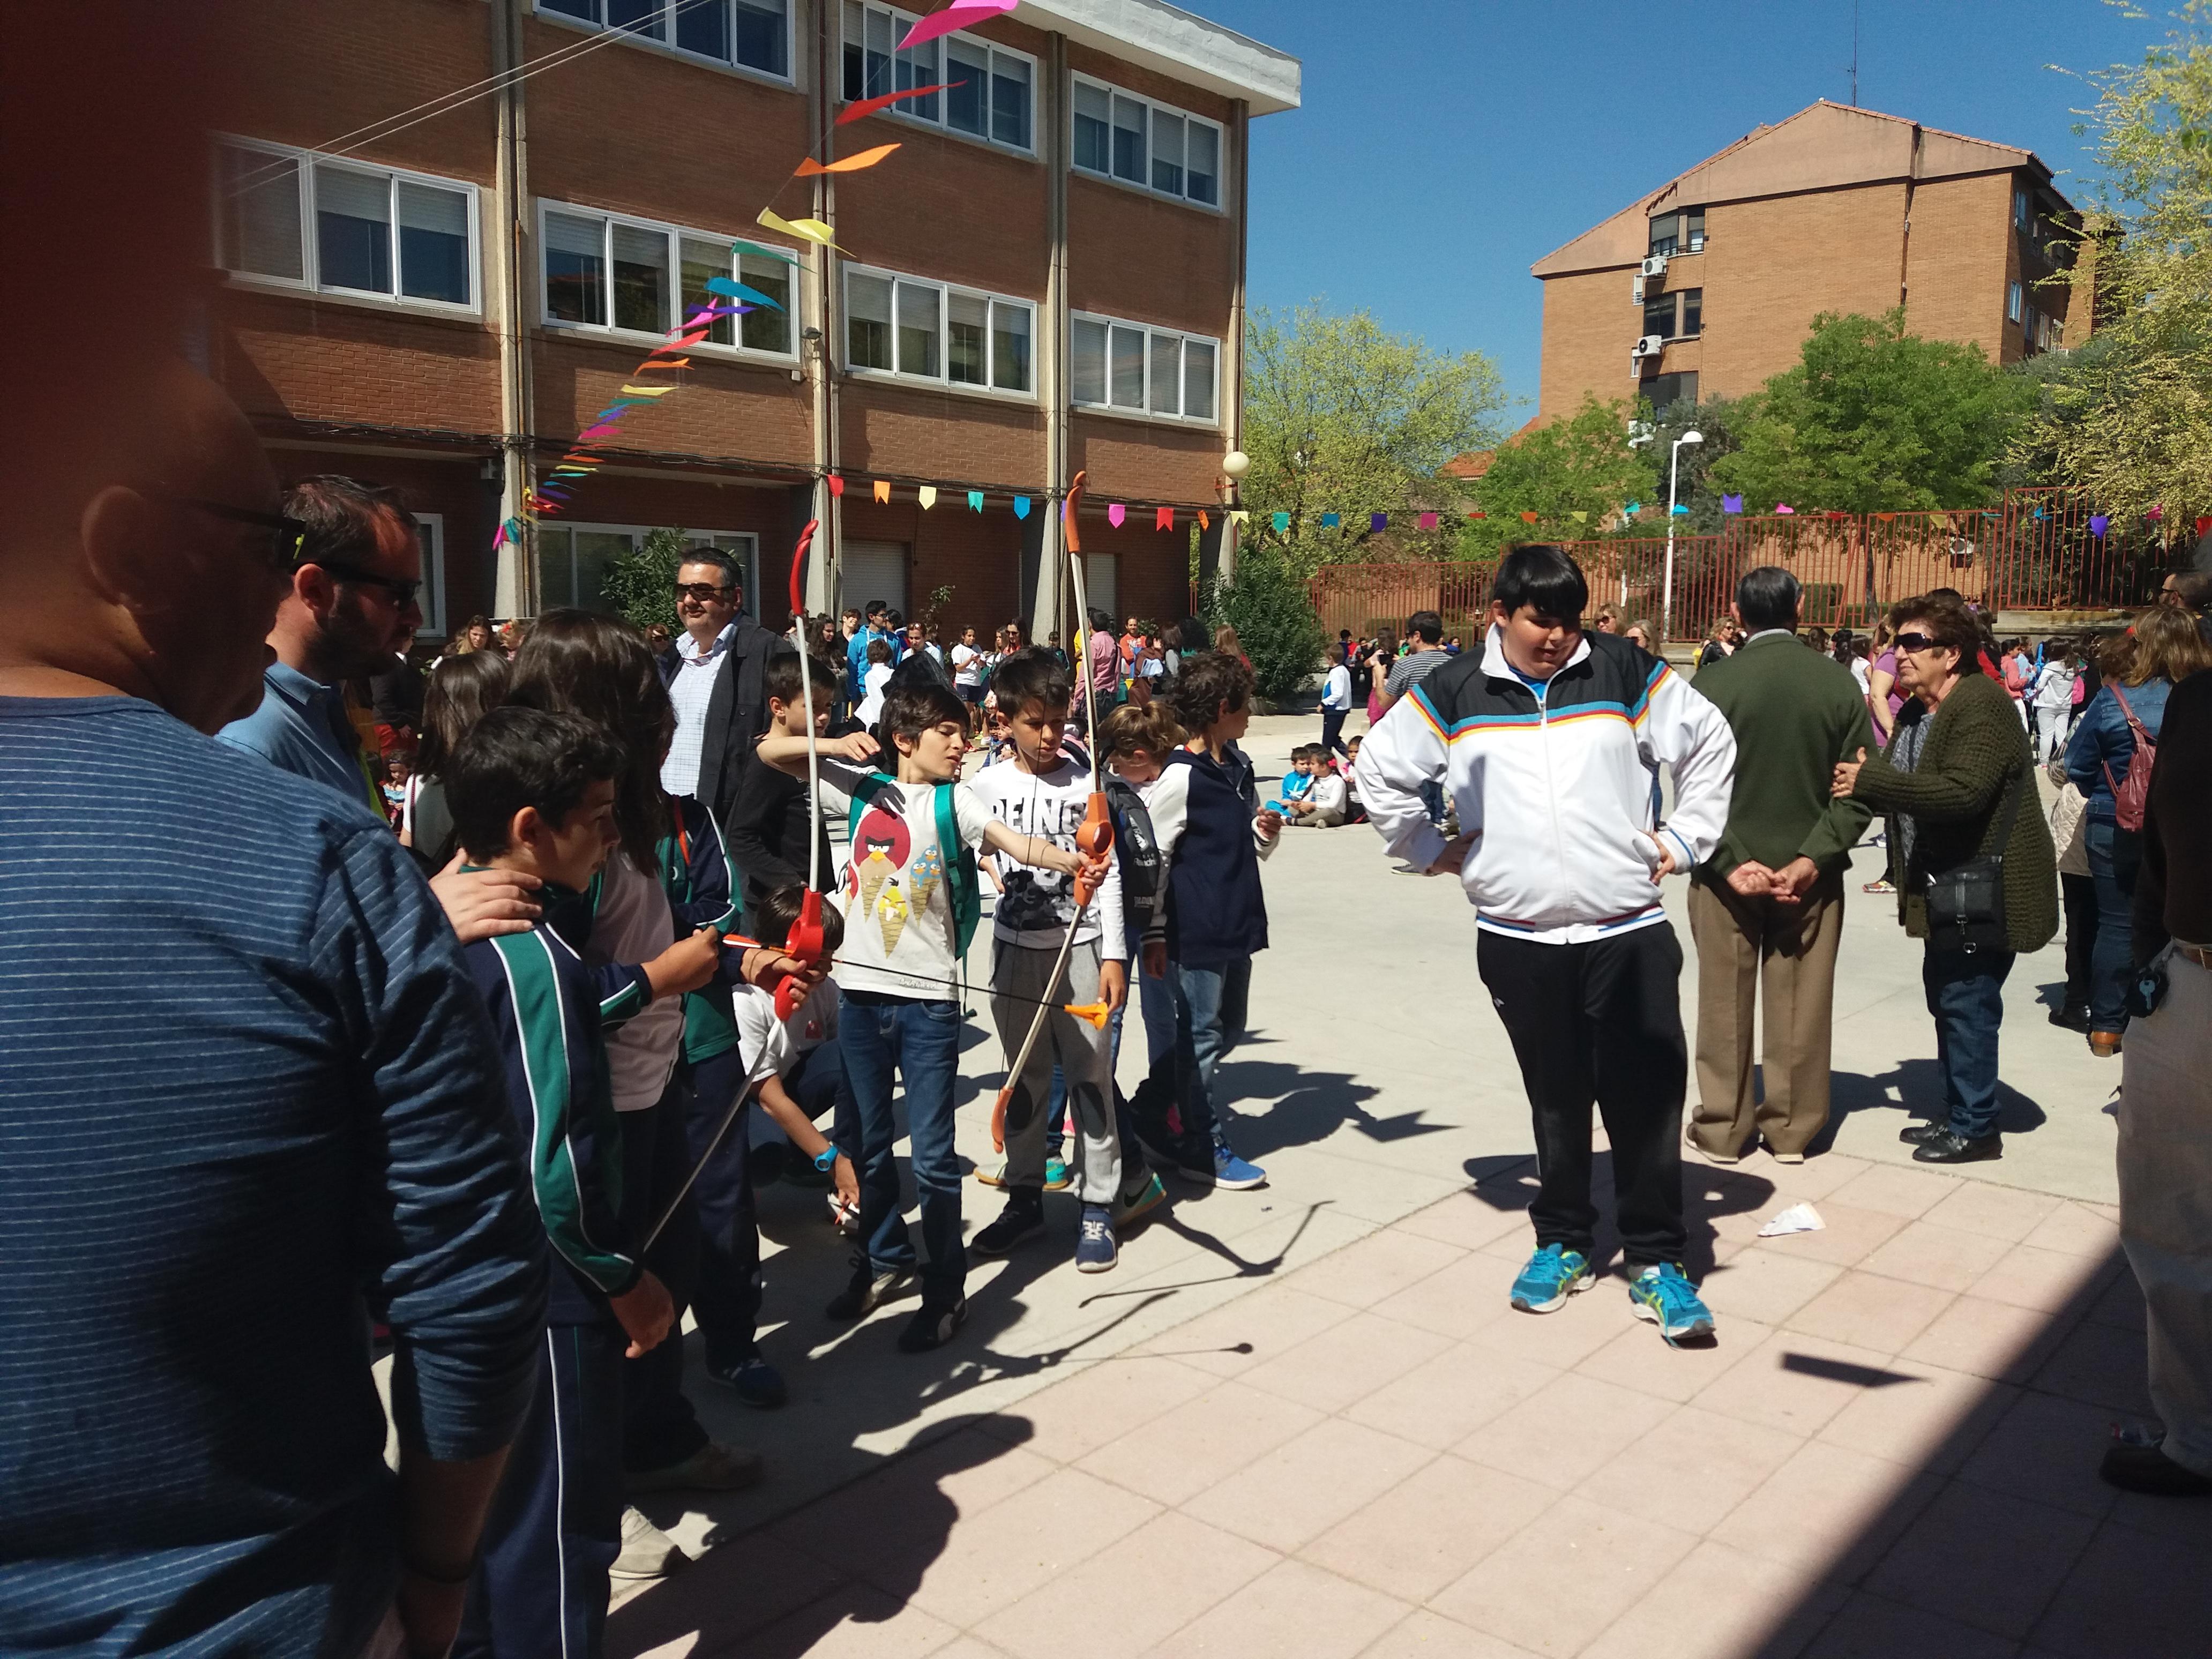 Semana Cultural 2017 Visita Al Mercadillo Medieval Del C E I P Garcilaso De La Vega Ceip Ciudad De Nara Toledo